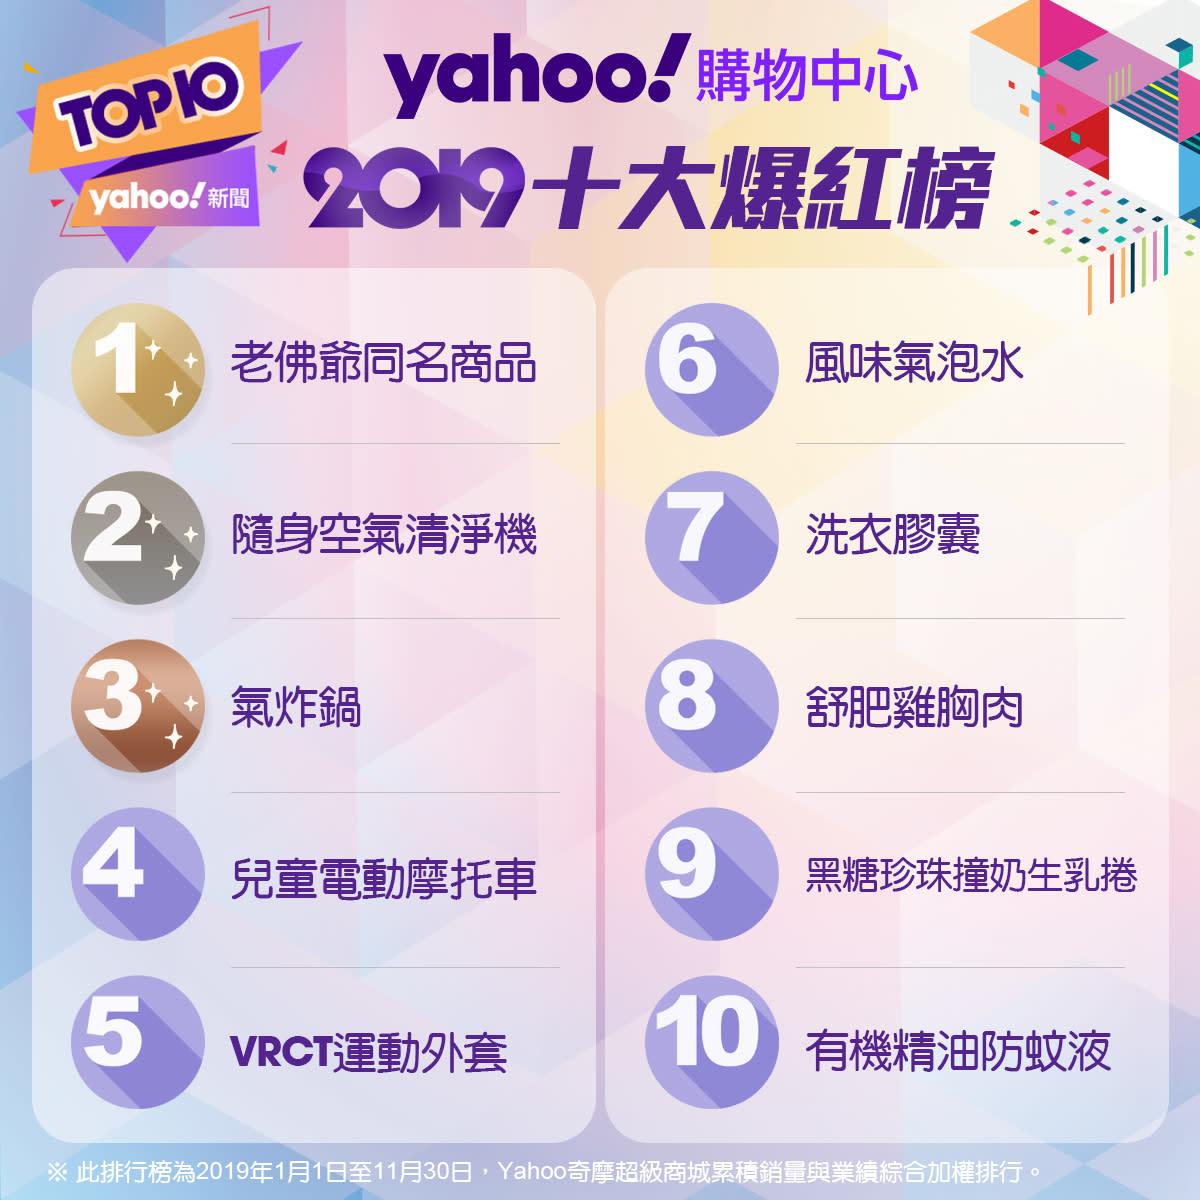 Yahoo奇摩電商2019十大總盤點!話題消費趨勢大公開